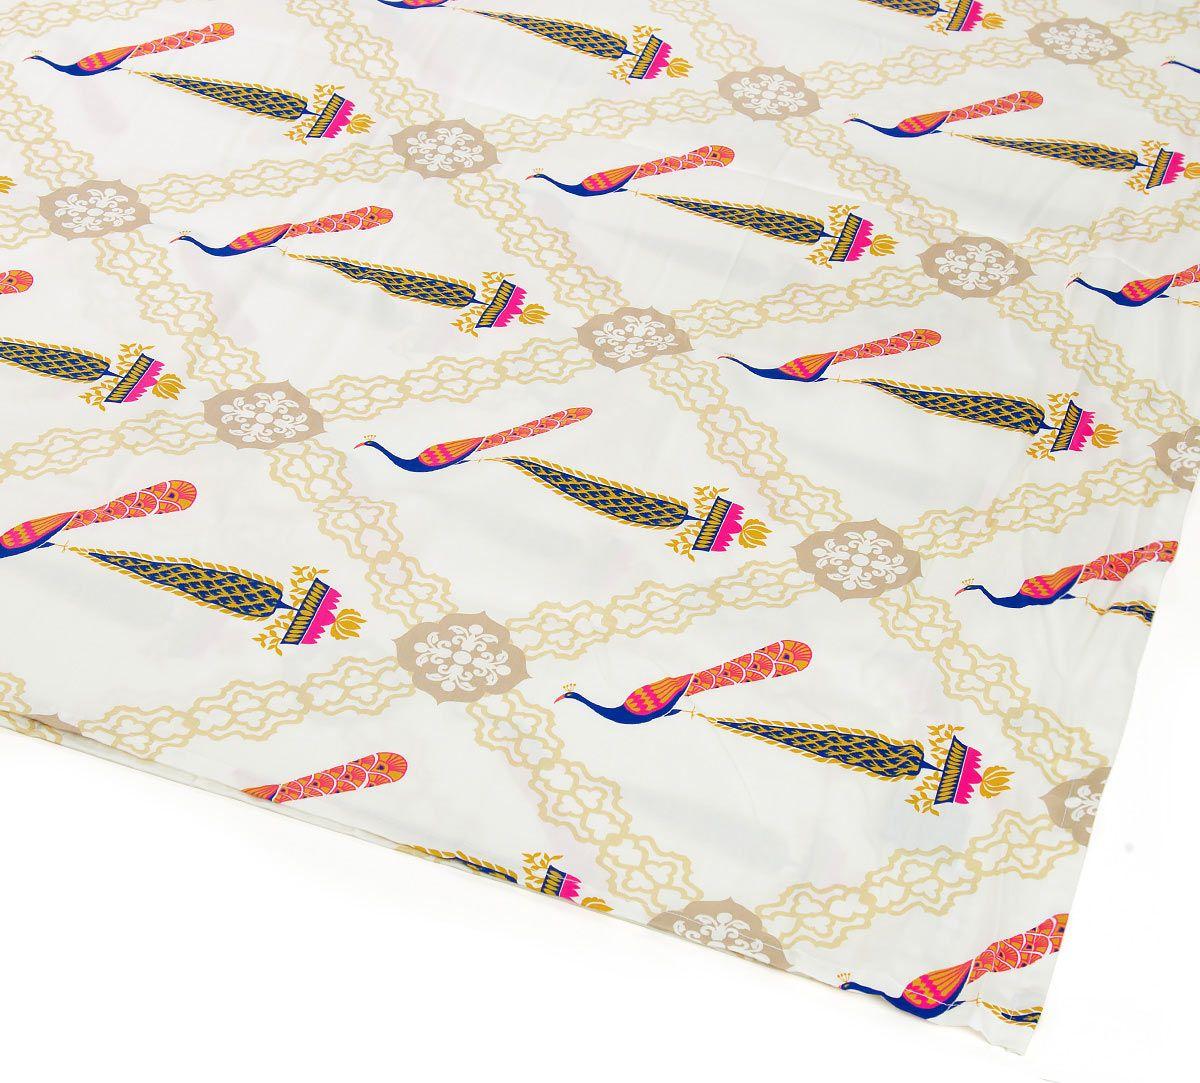 India Circus Conifer Peacock Bed Sheet Set